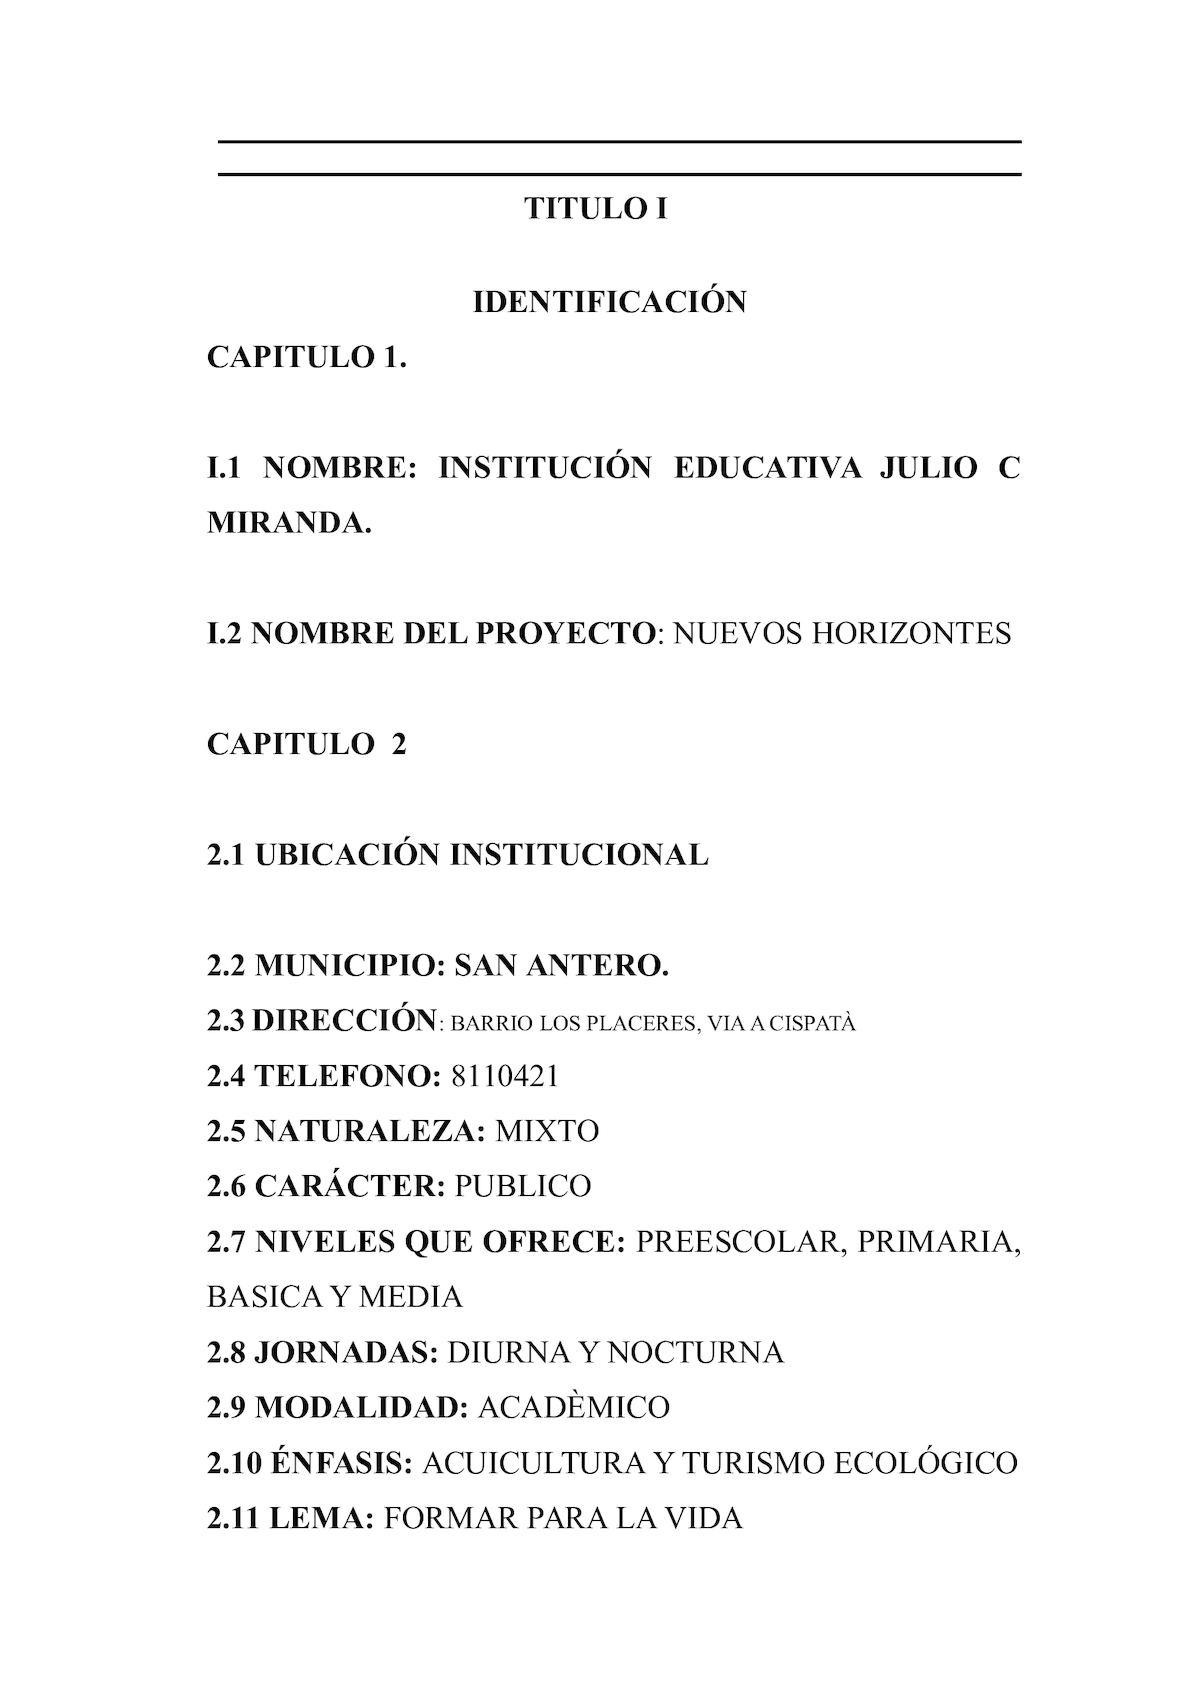 Calaméo - P E I Sin Reestructuracion I E Julio C Miranda 2009 San ...